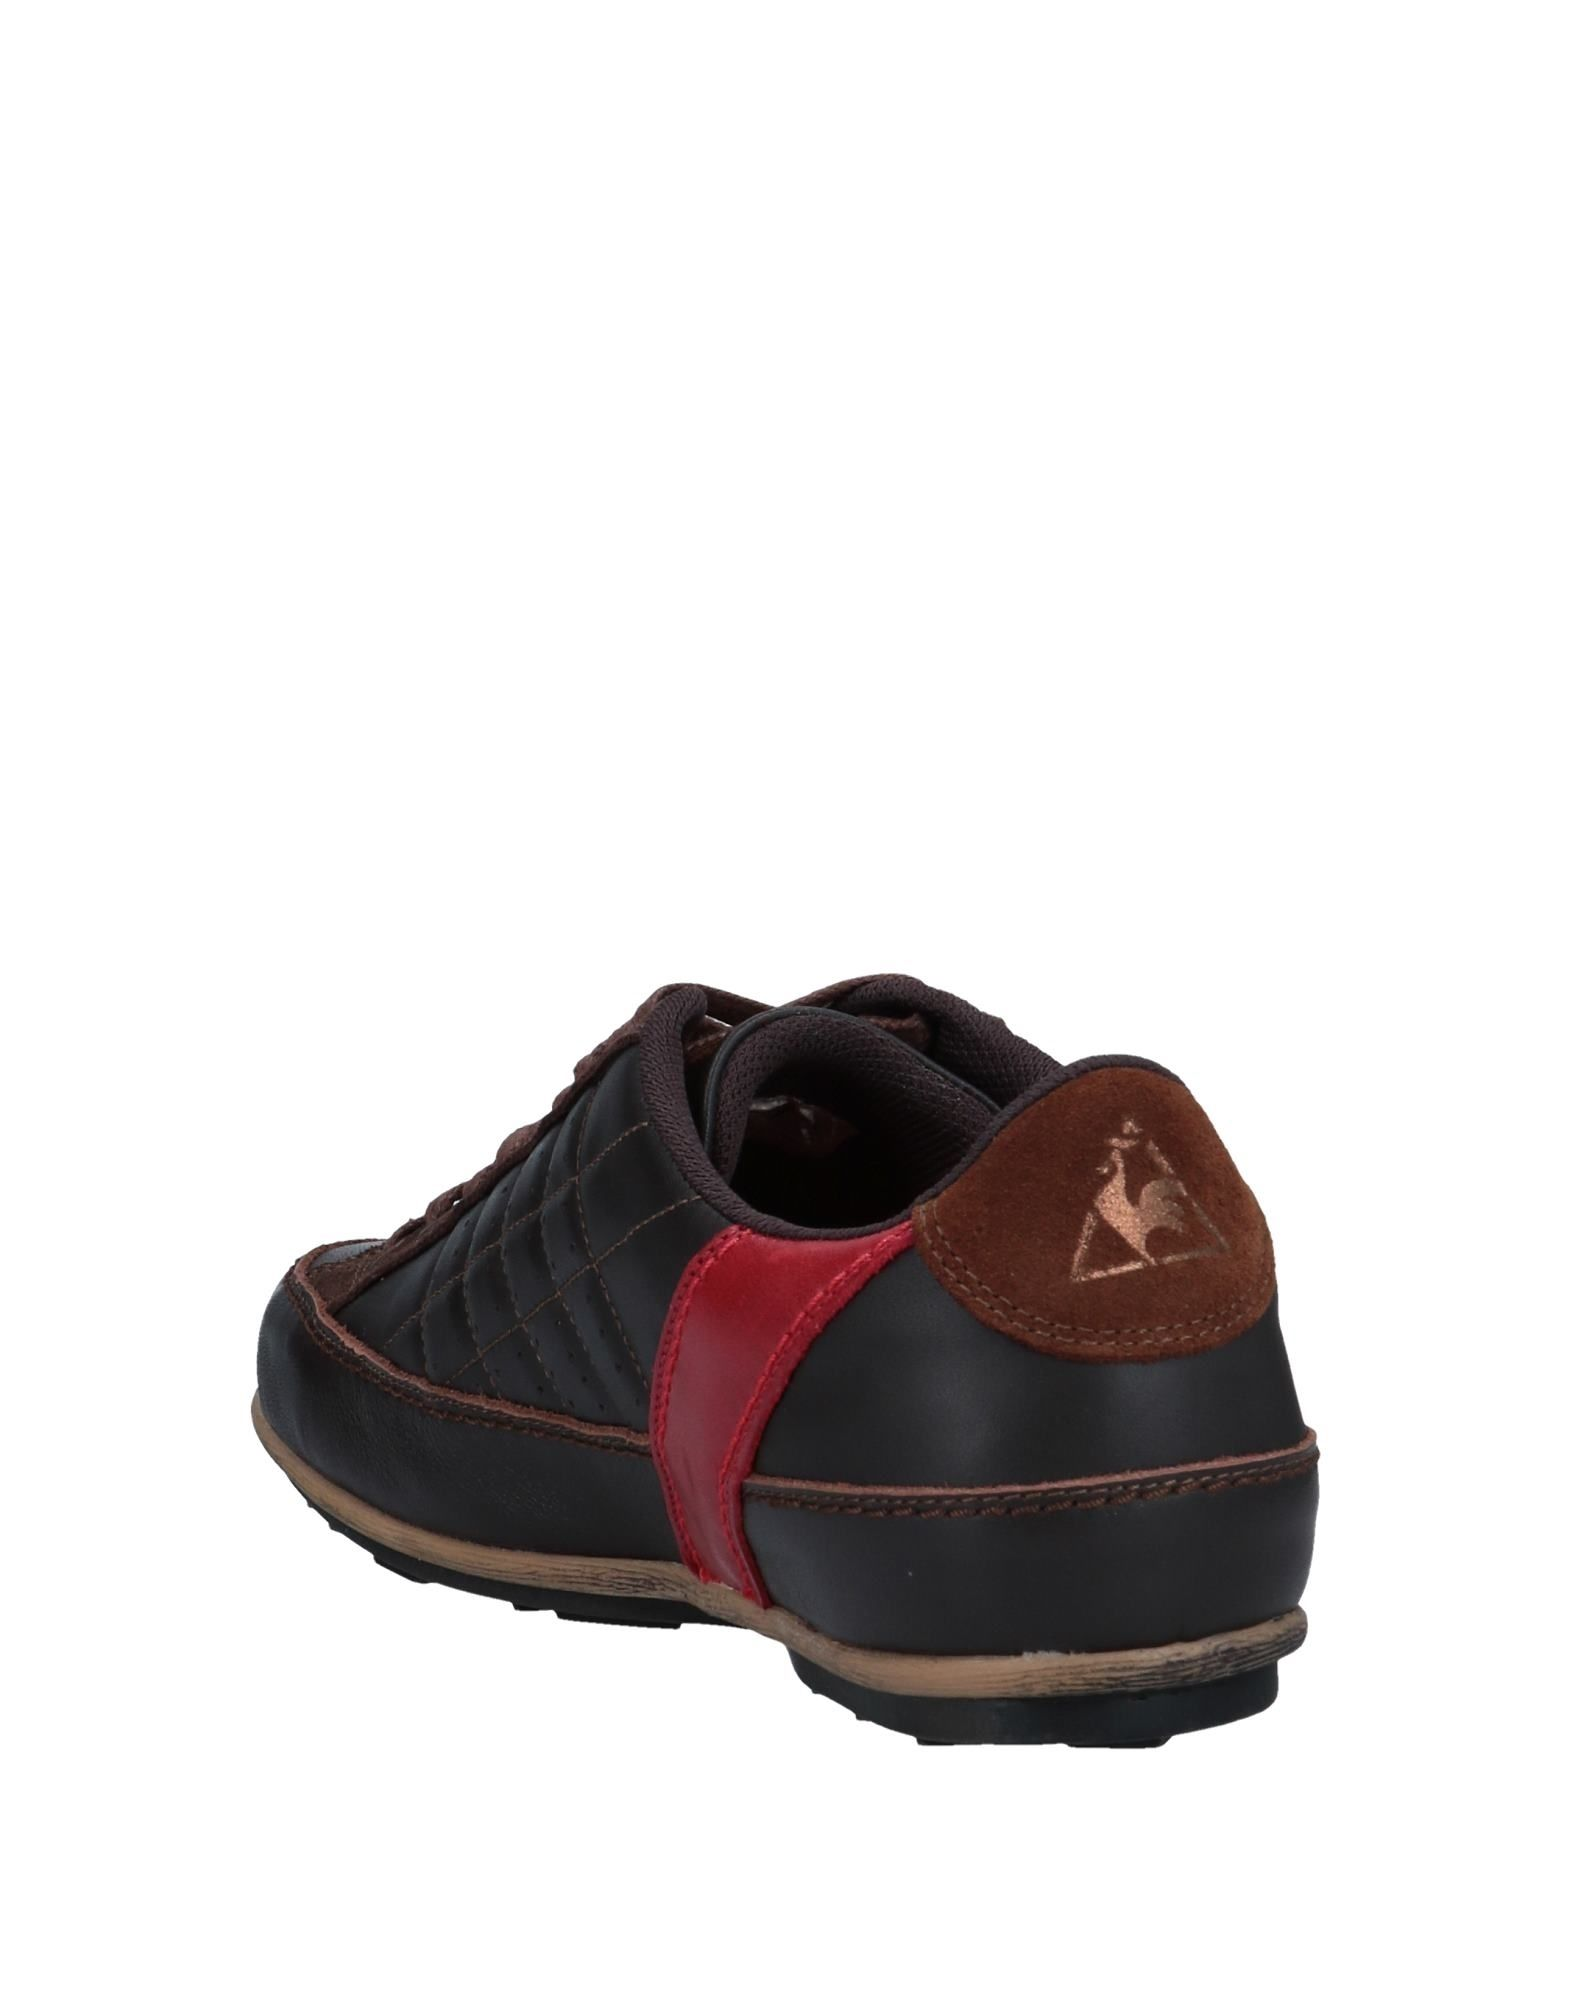 Rabatt echte Schuhe Le  Coq Sportif Sneakers Herren  Le 11549114SV 474f27